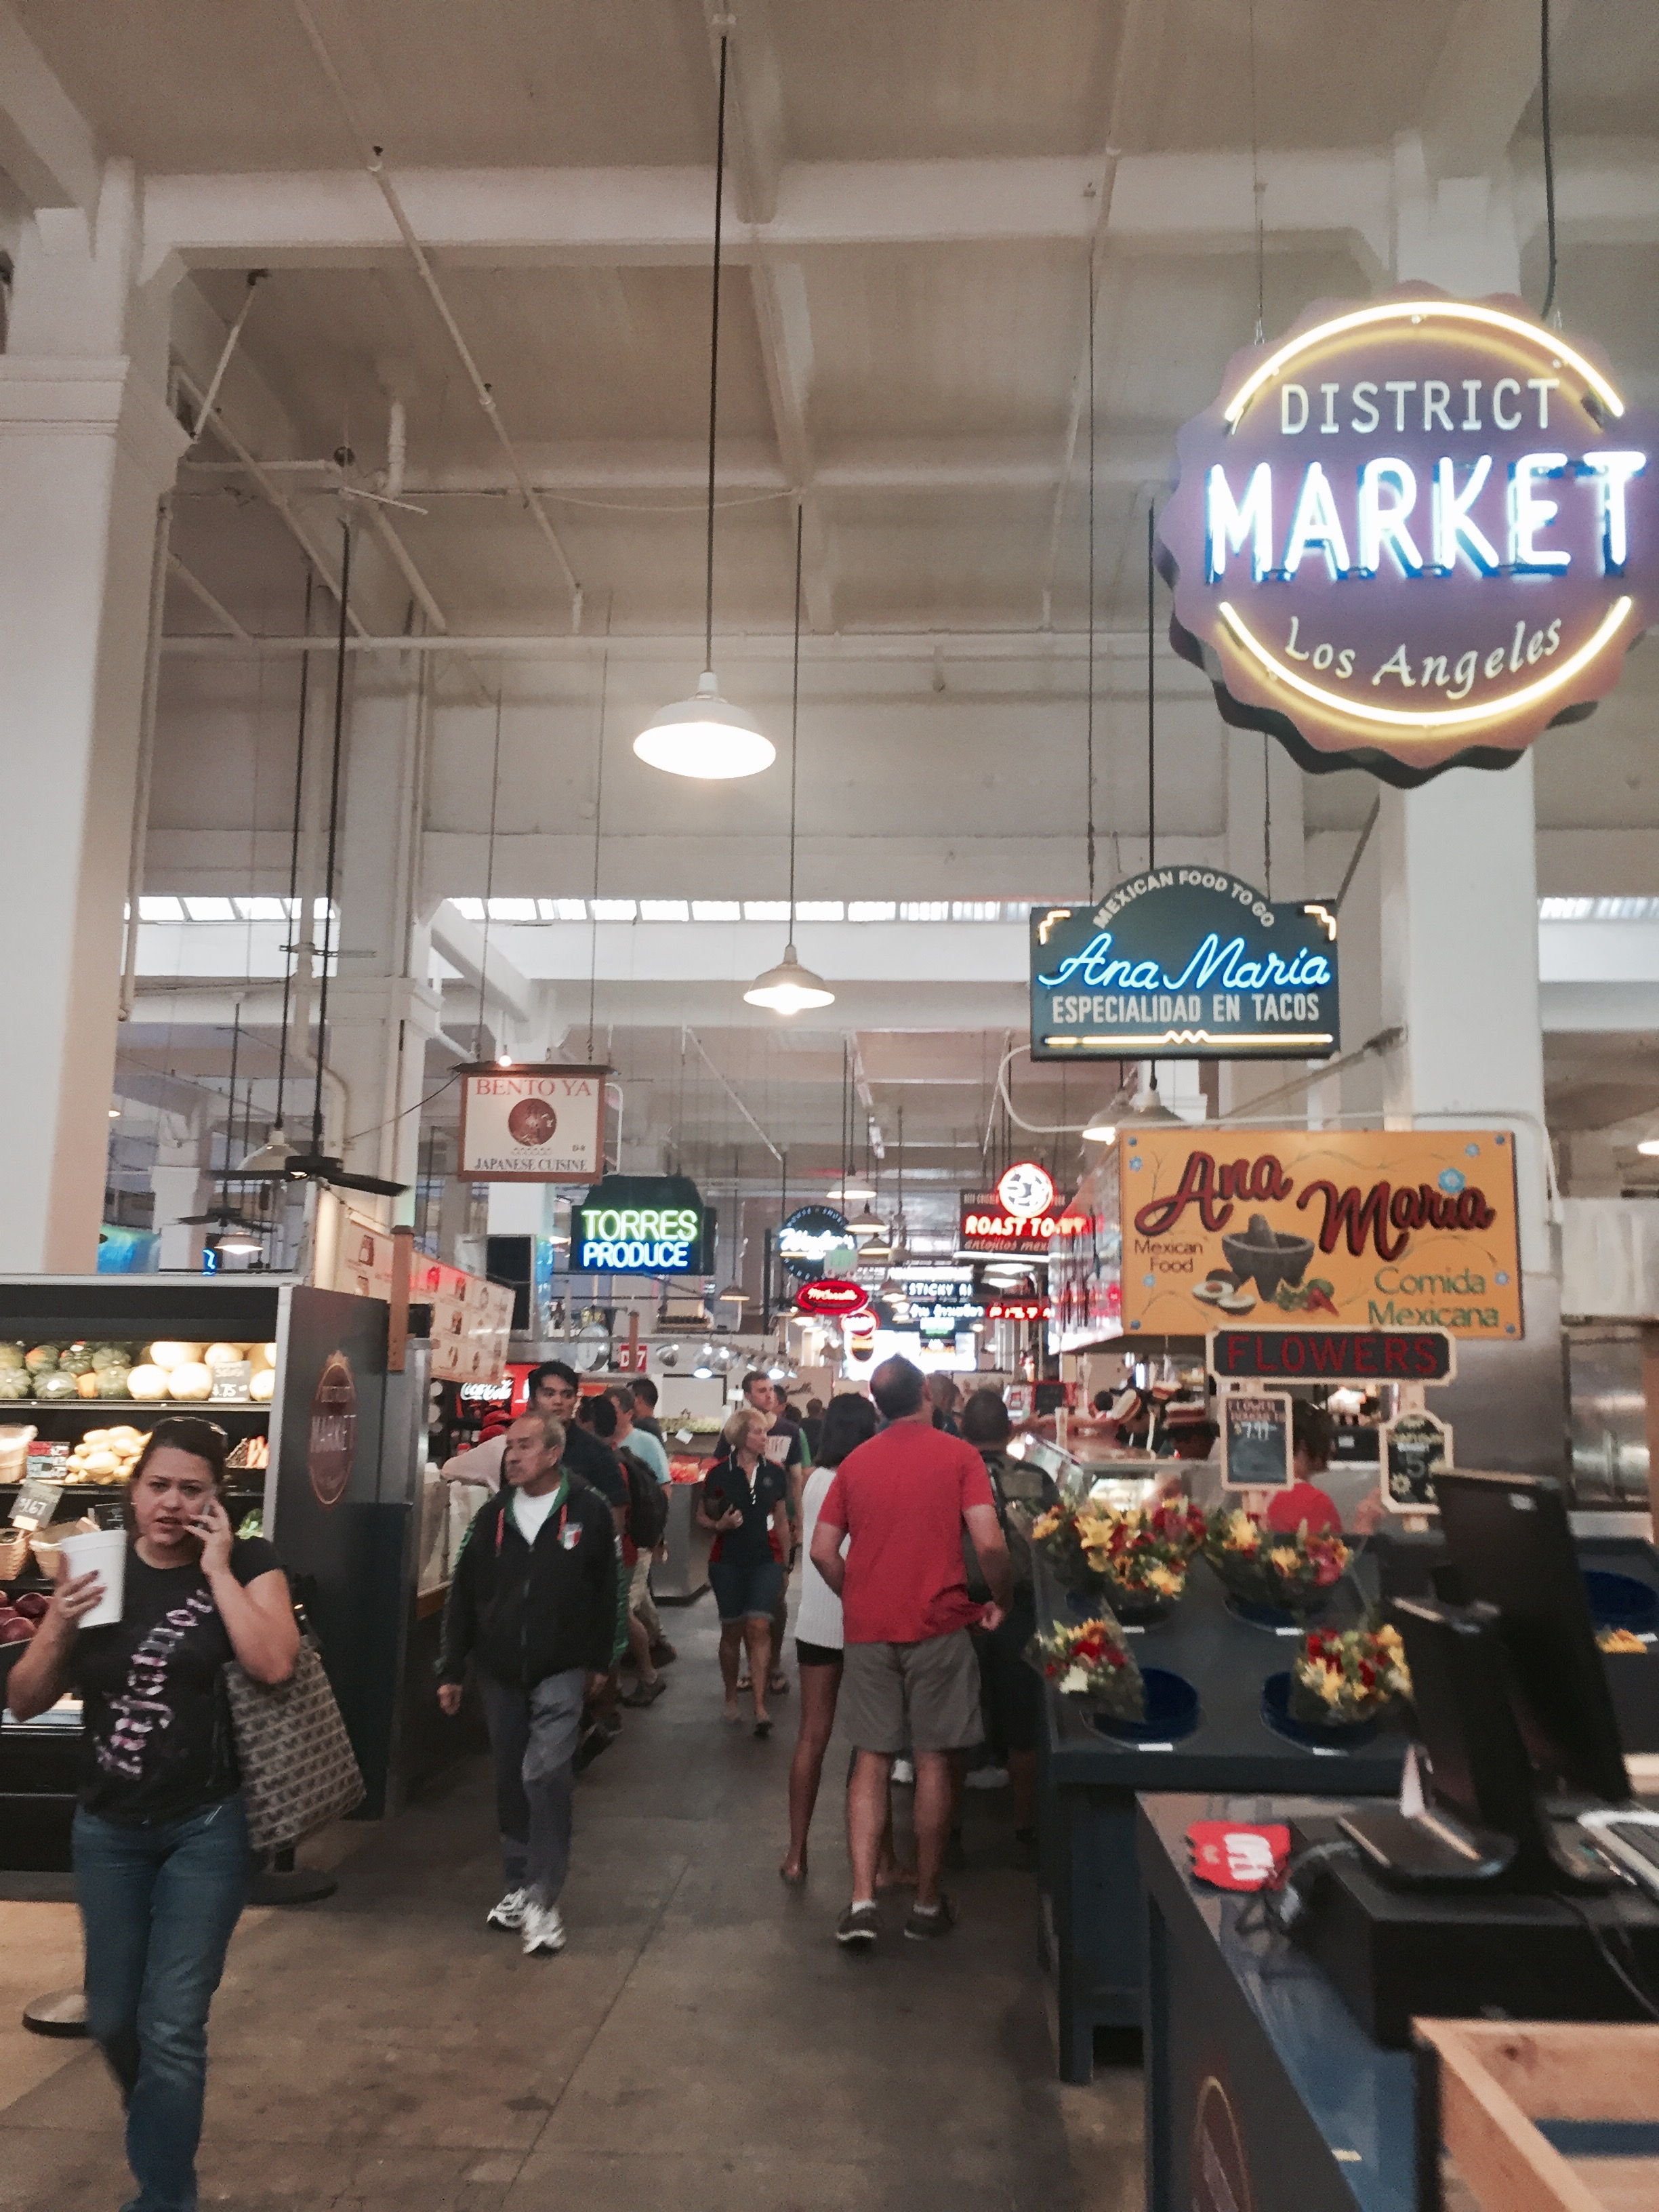 Love this little city market